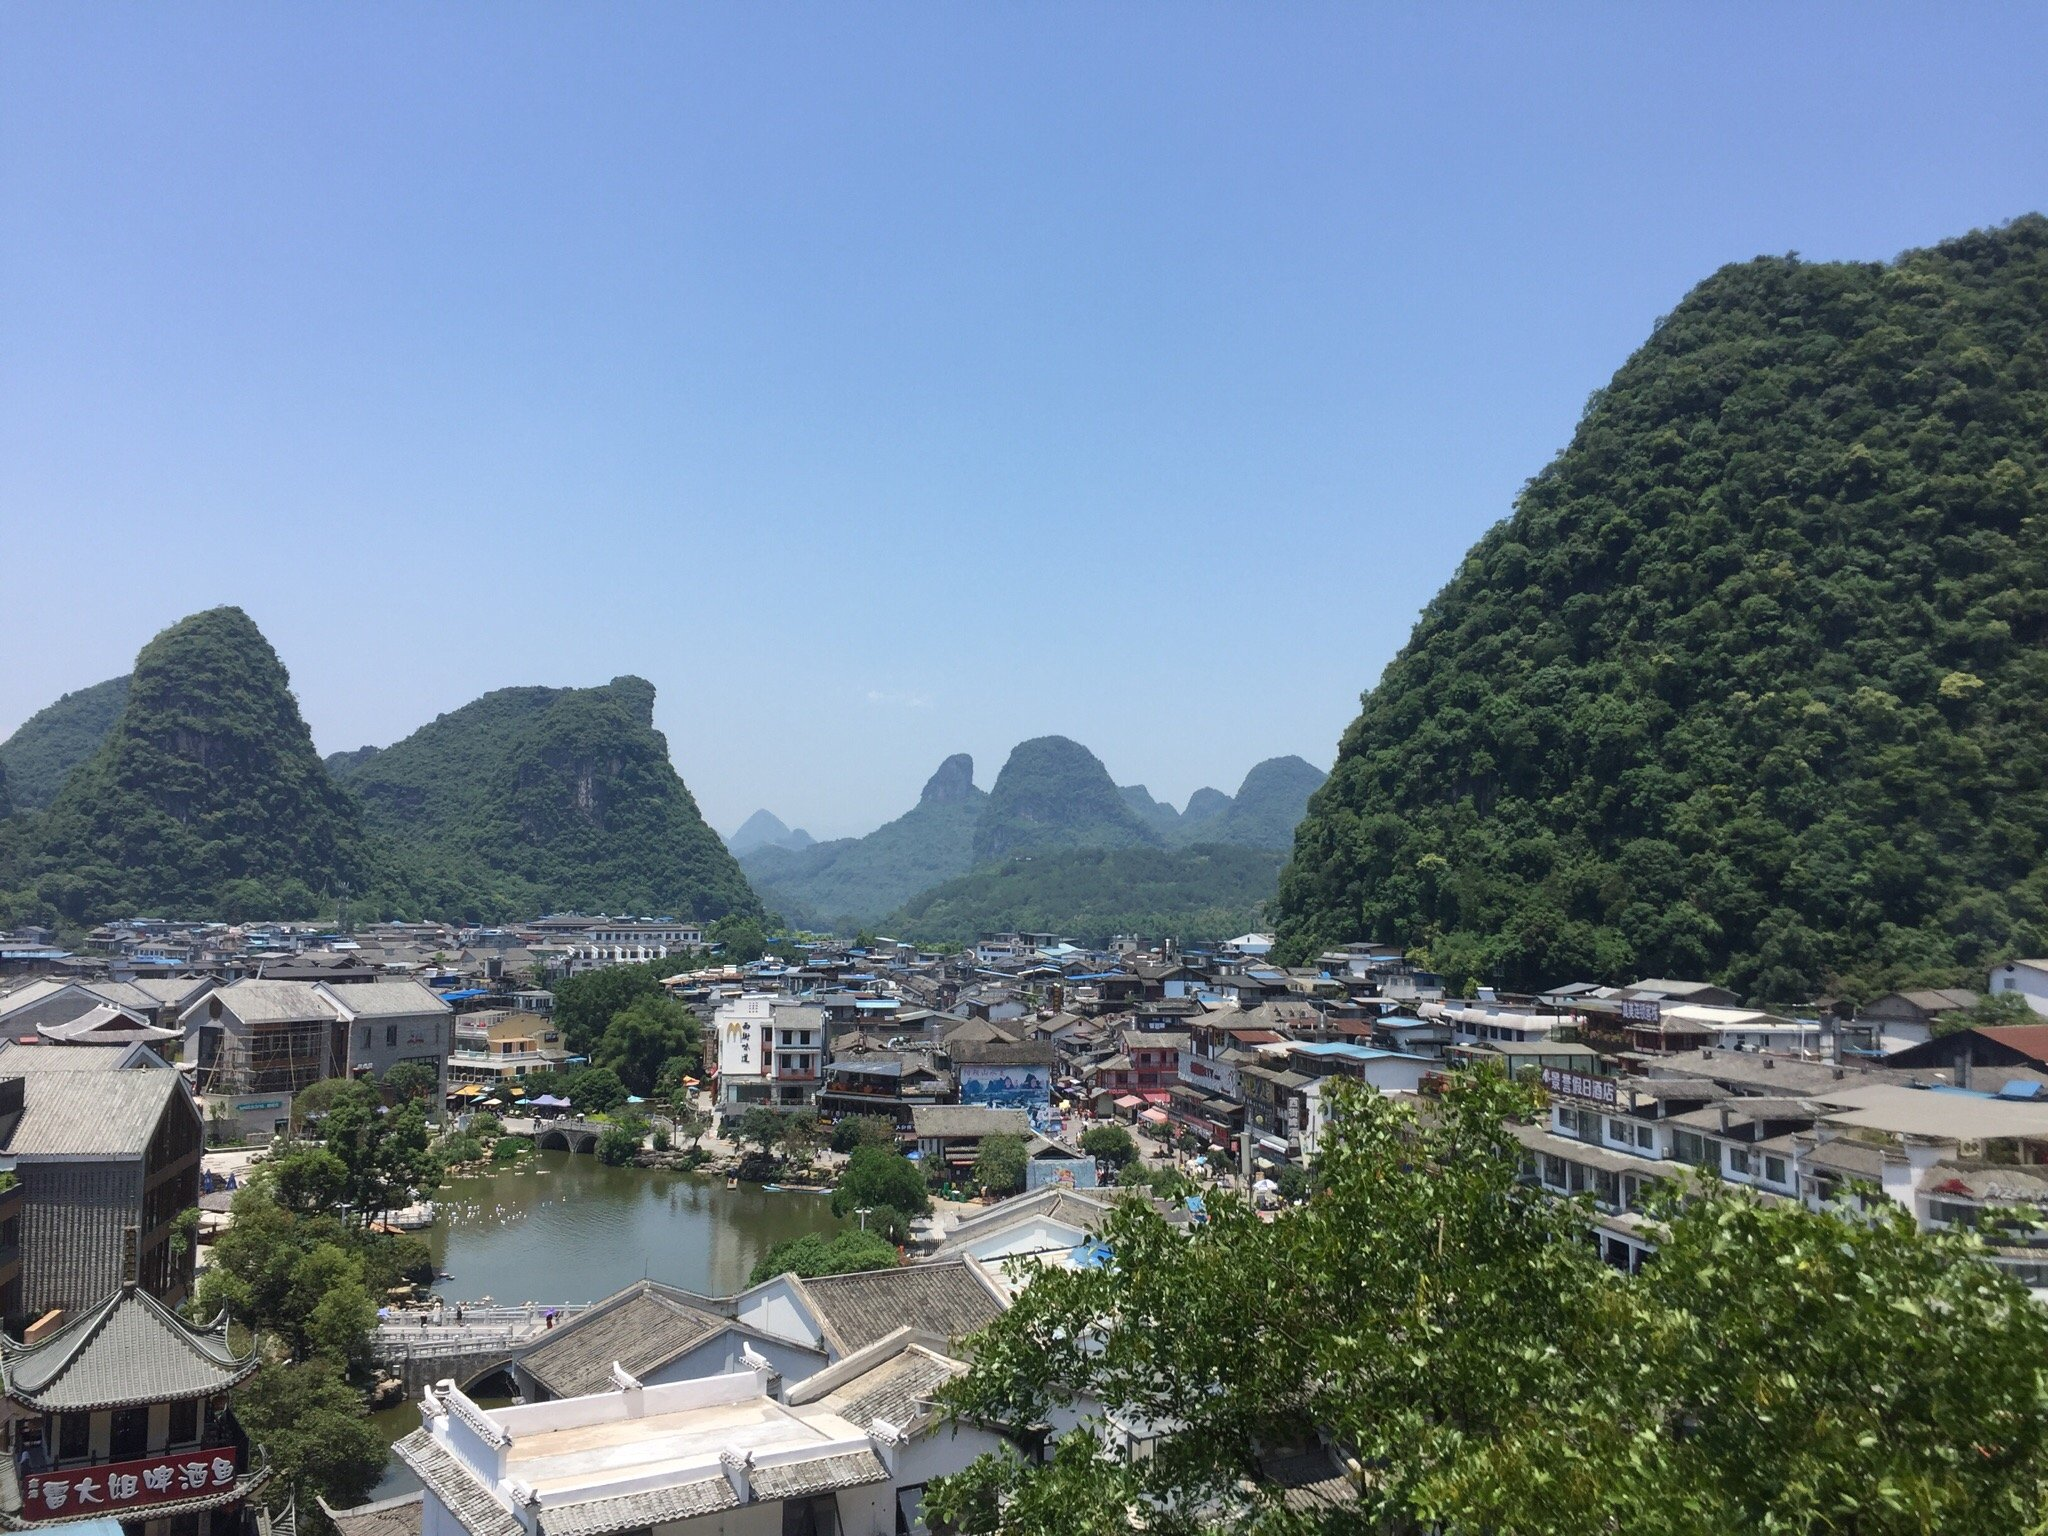 fanli hotel prices reviews yangshuo county china tripadvisor rh tripadvisor com